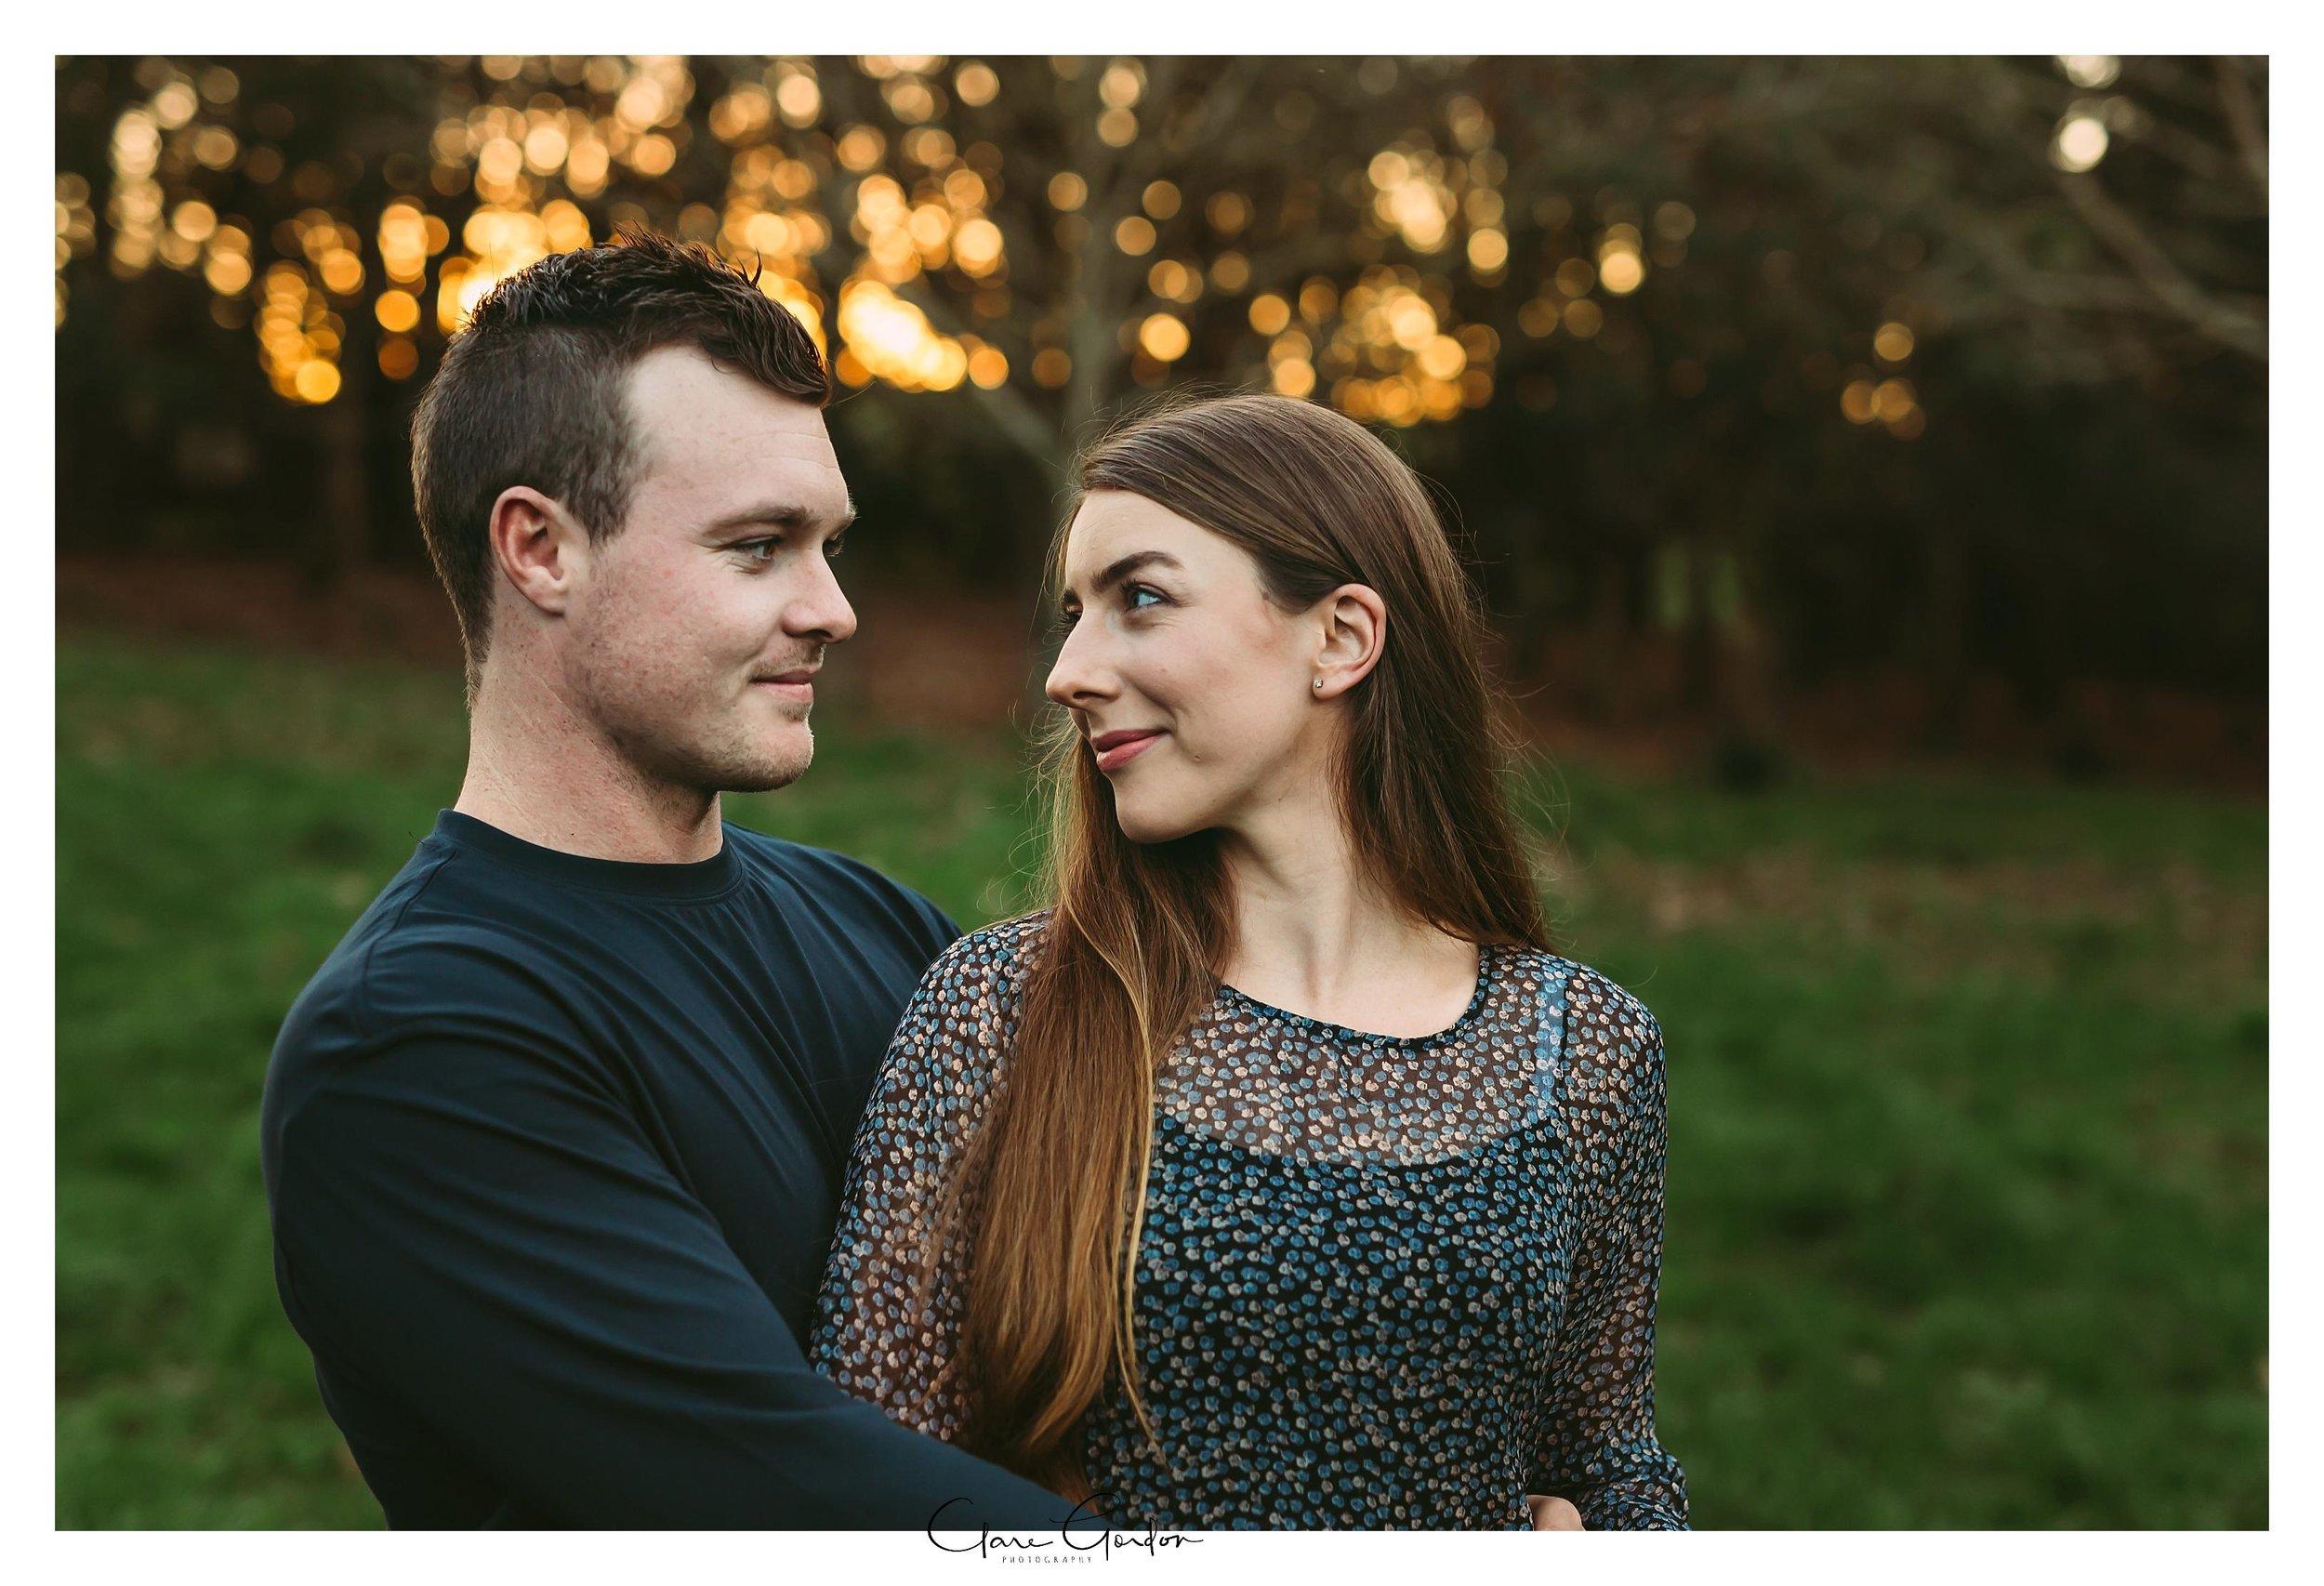 Shaun-Celine-taitua-arboretum-engagement-photos-newzealand-wedding-photographer-waikato-wedding-photographer-waikato-wedding-photography (17).jpg